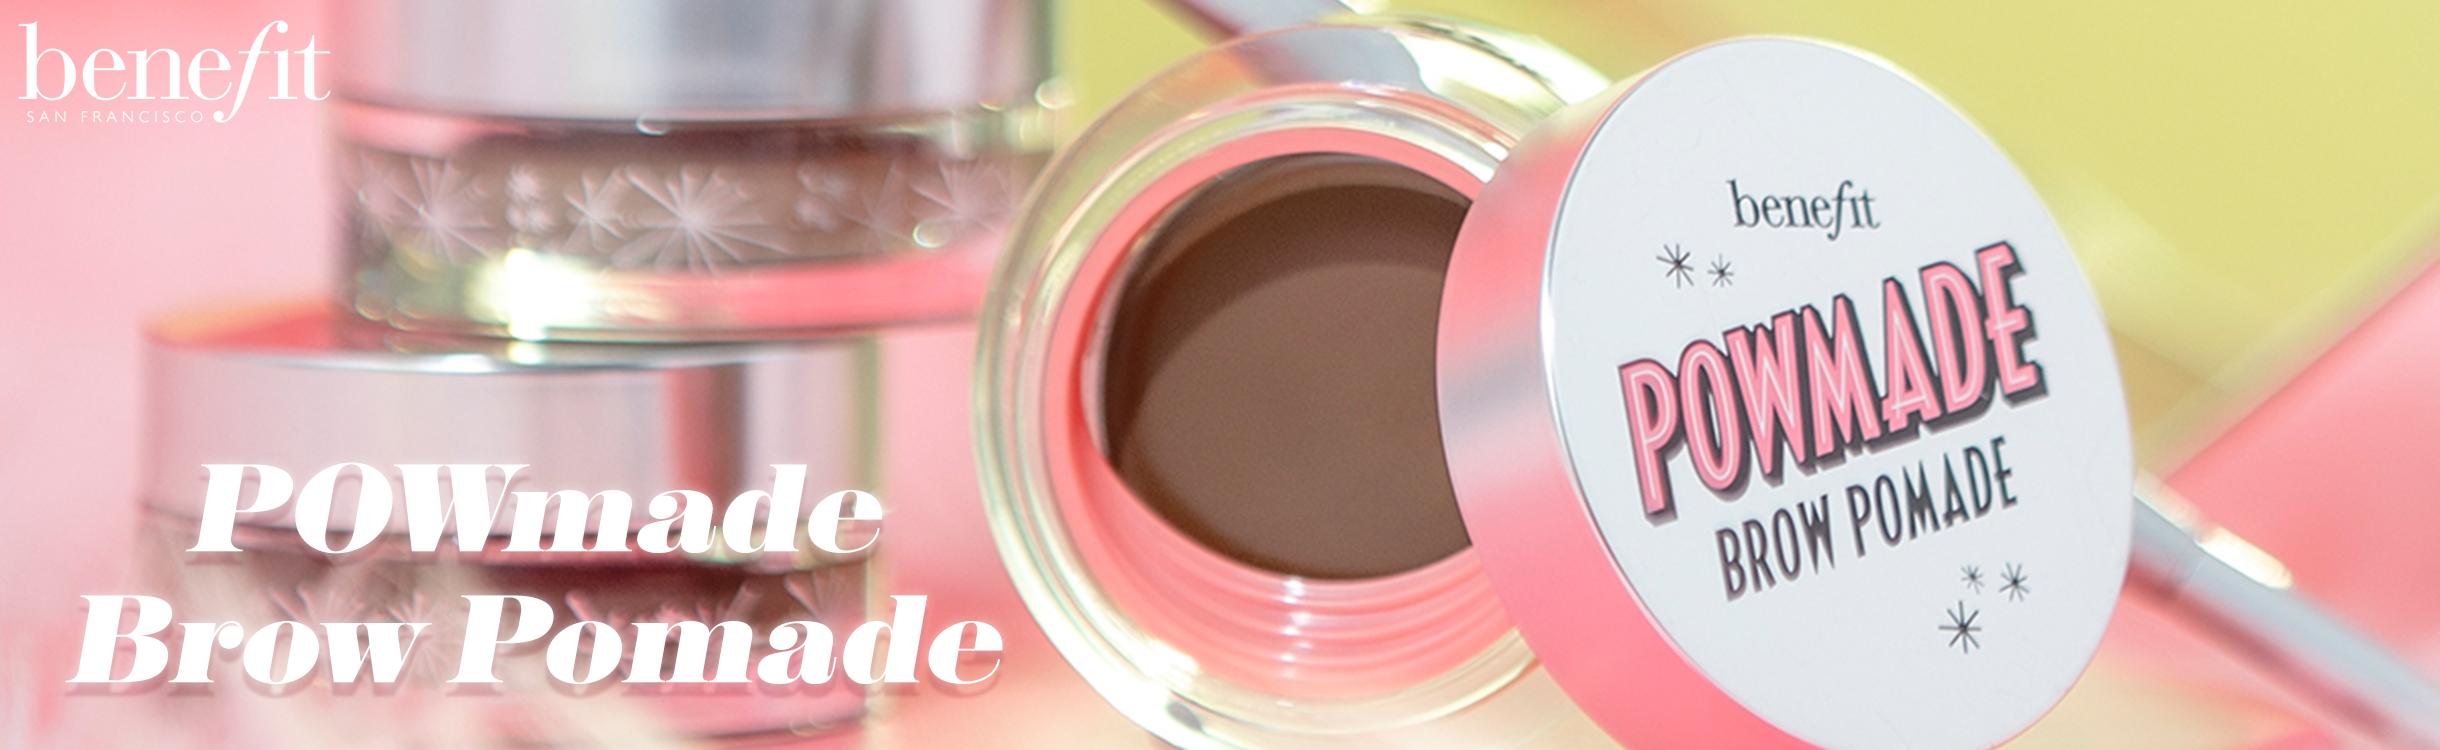 Benefit Cosmetics POWmade